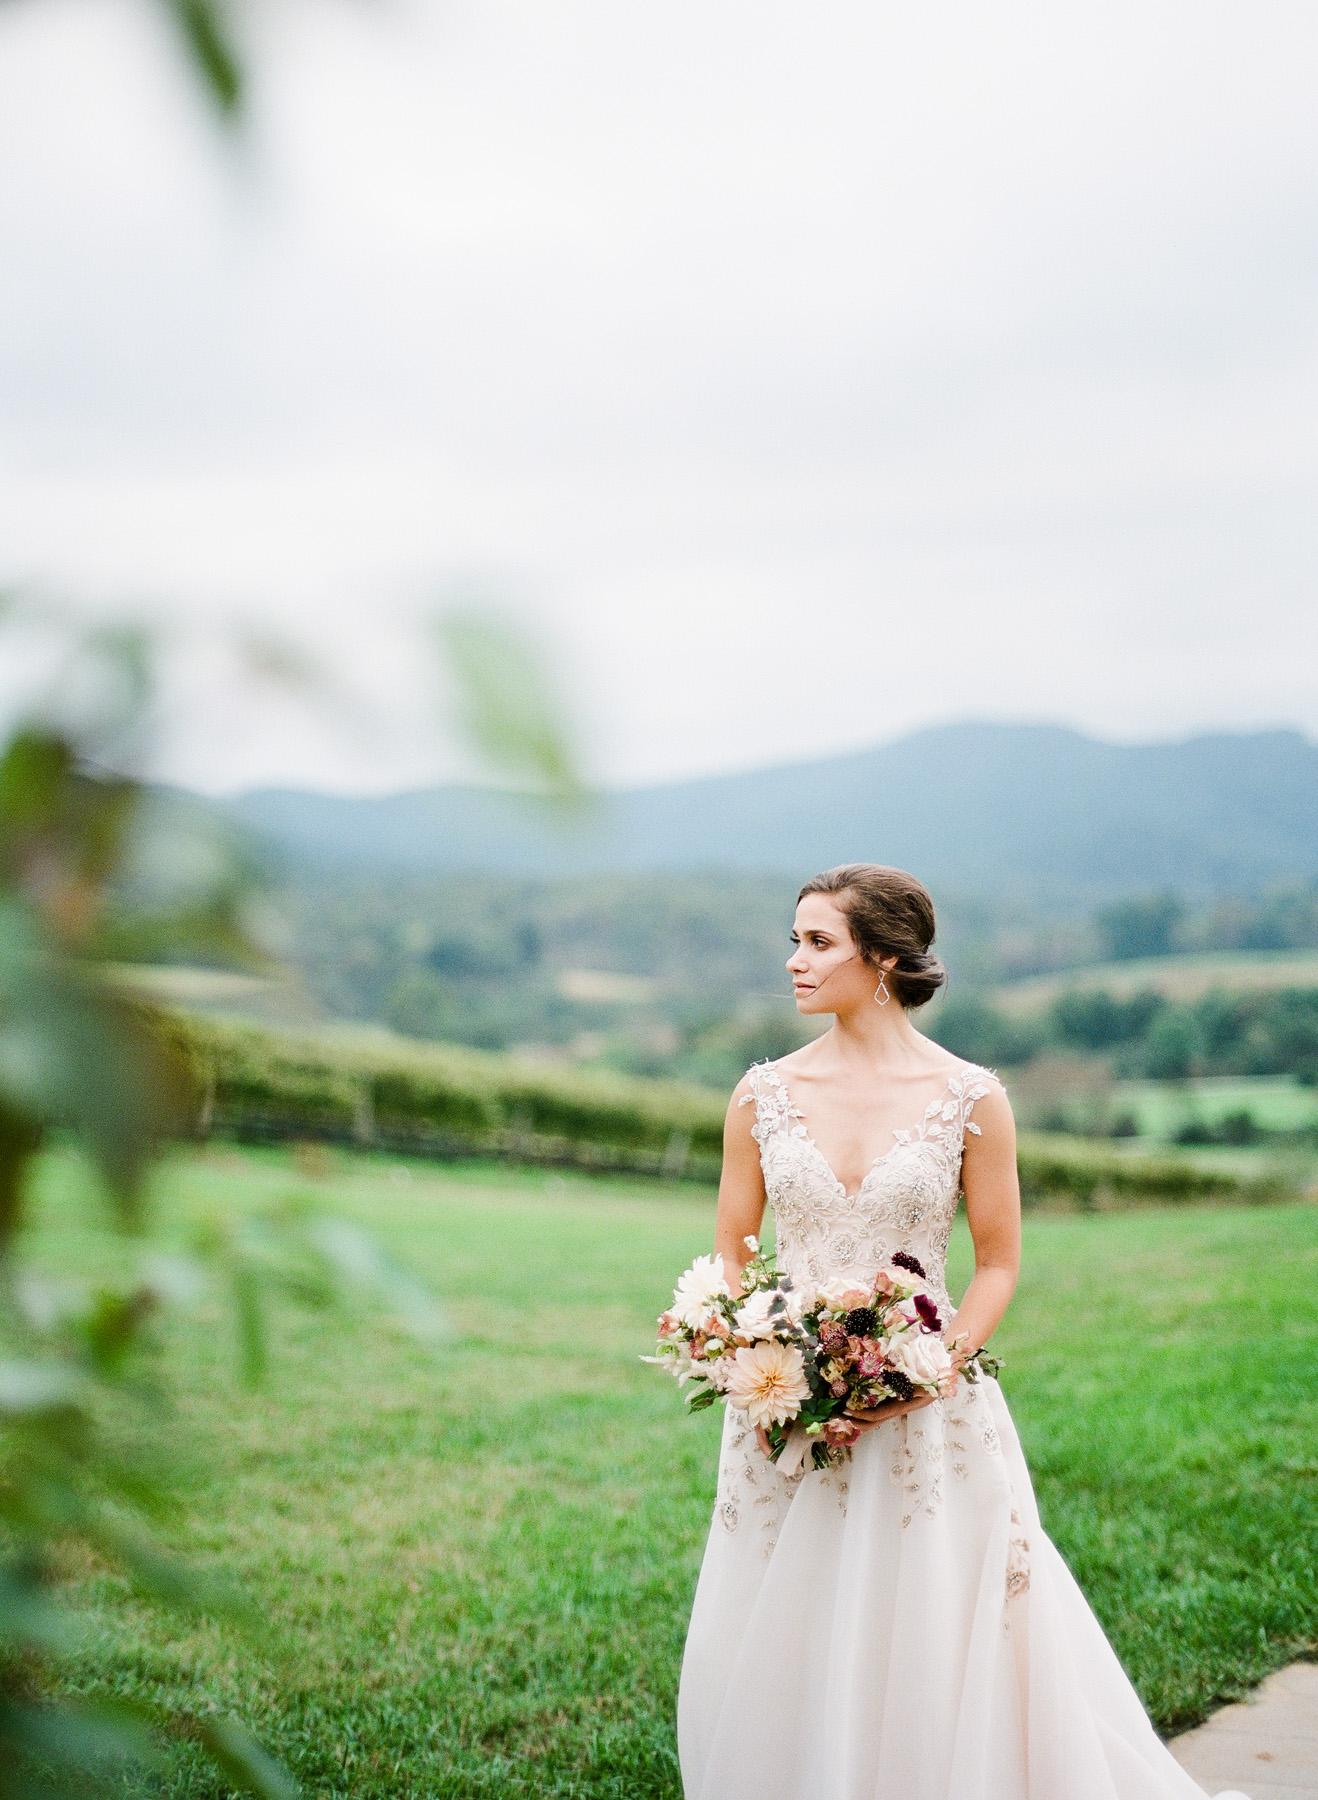 Pippin-Hill-Farm-and-Vinyards-Wedding-Film-Photography-12.jpg